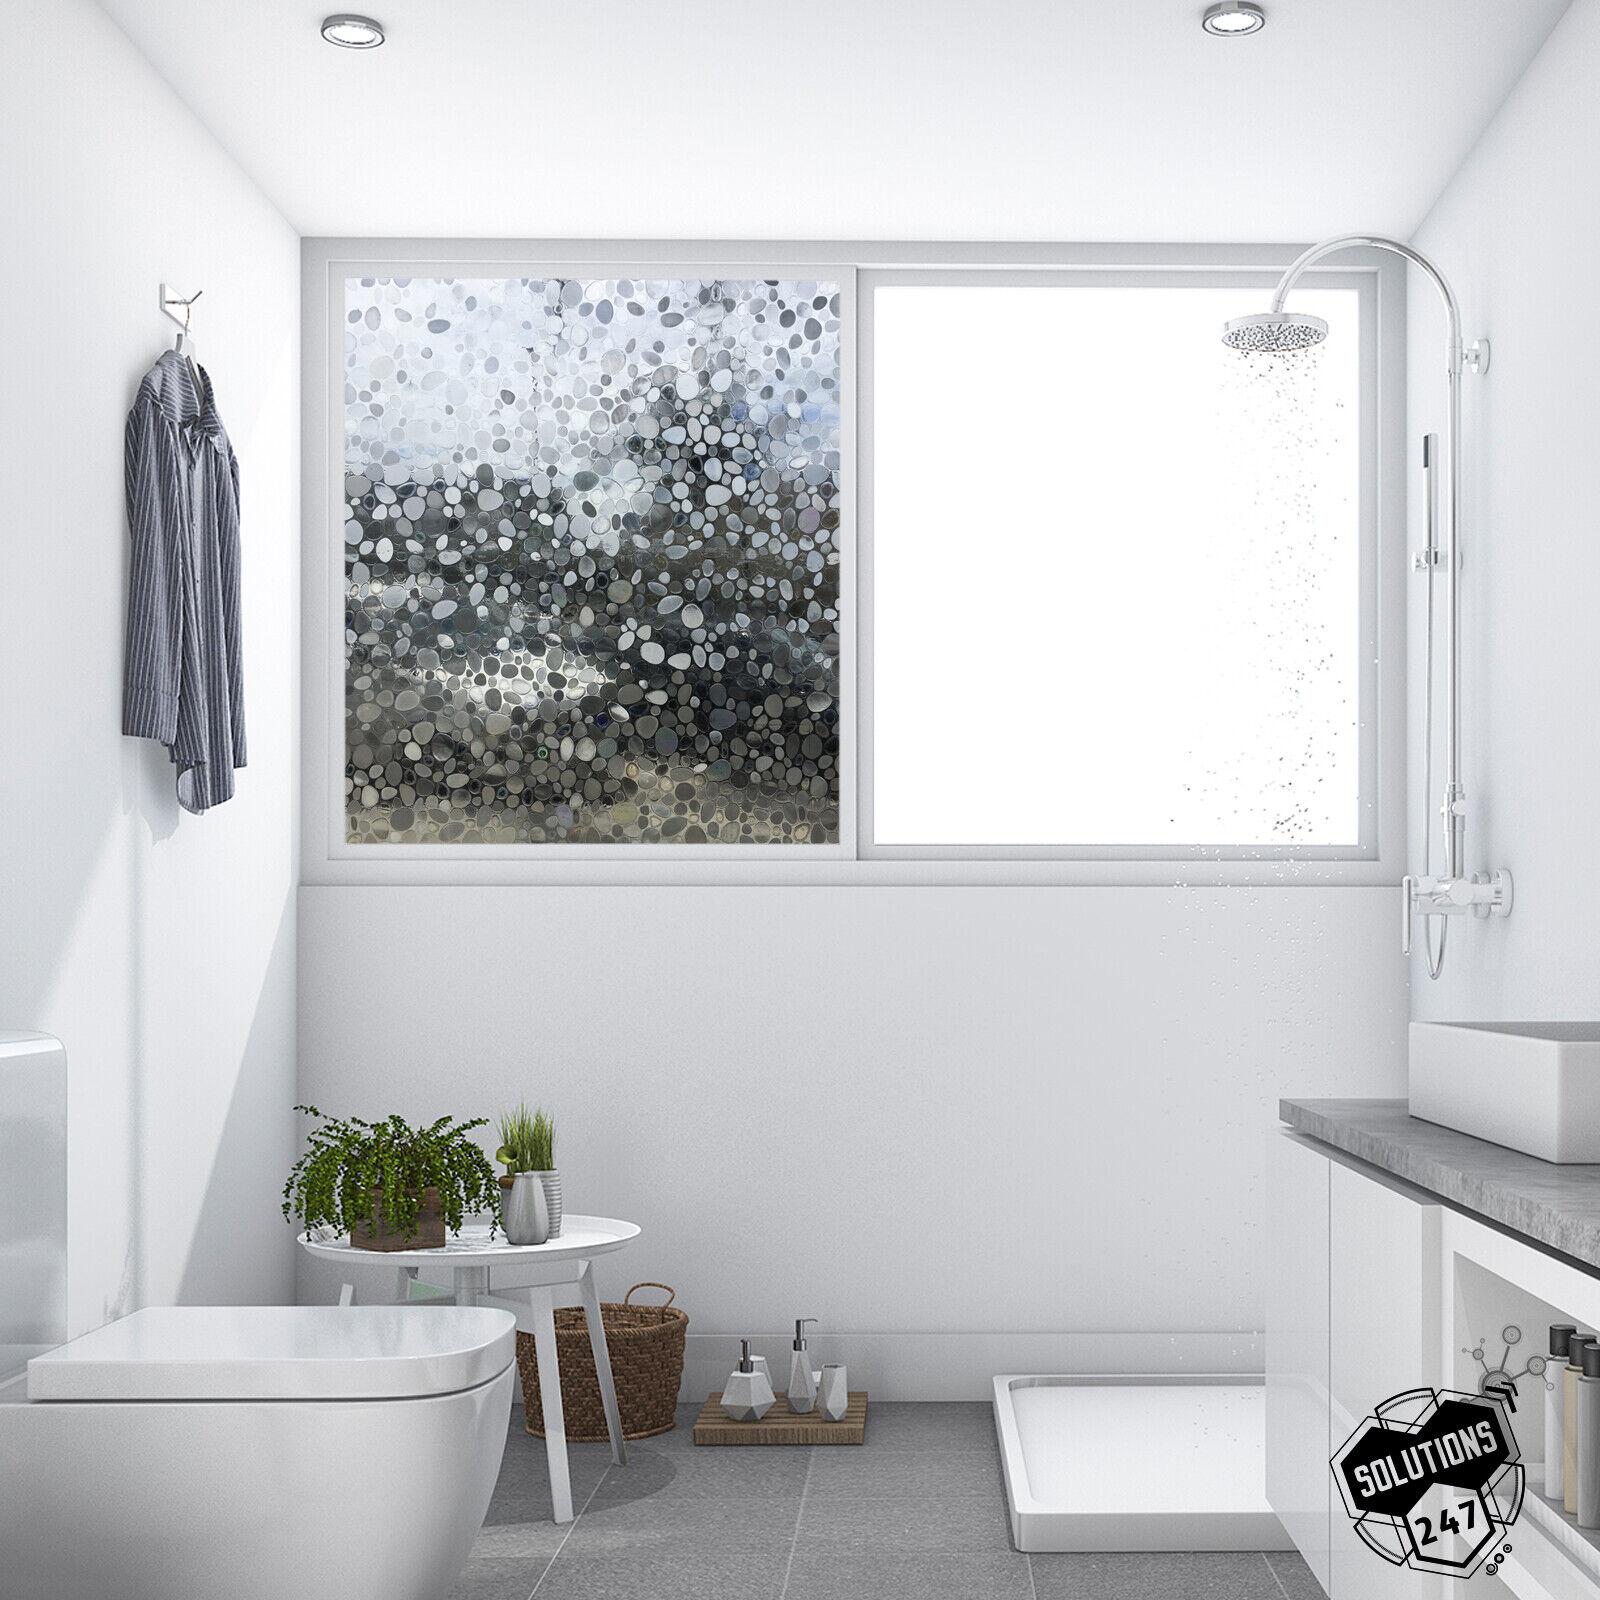 Design Film Office Bedroom Bathroom